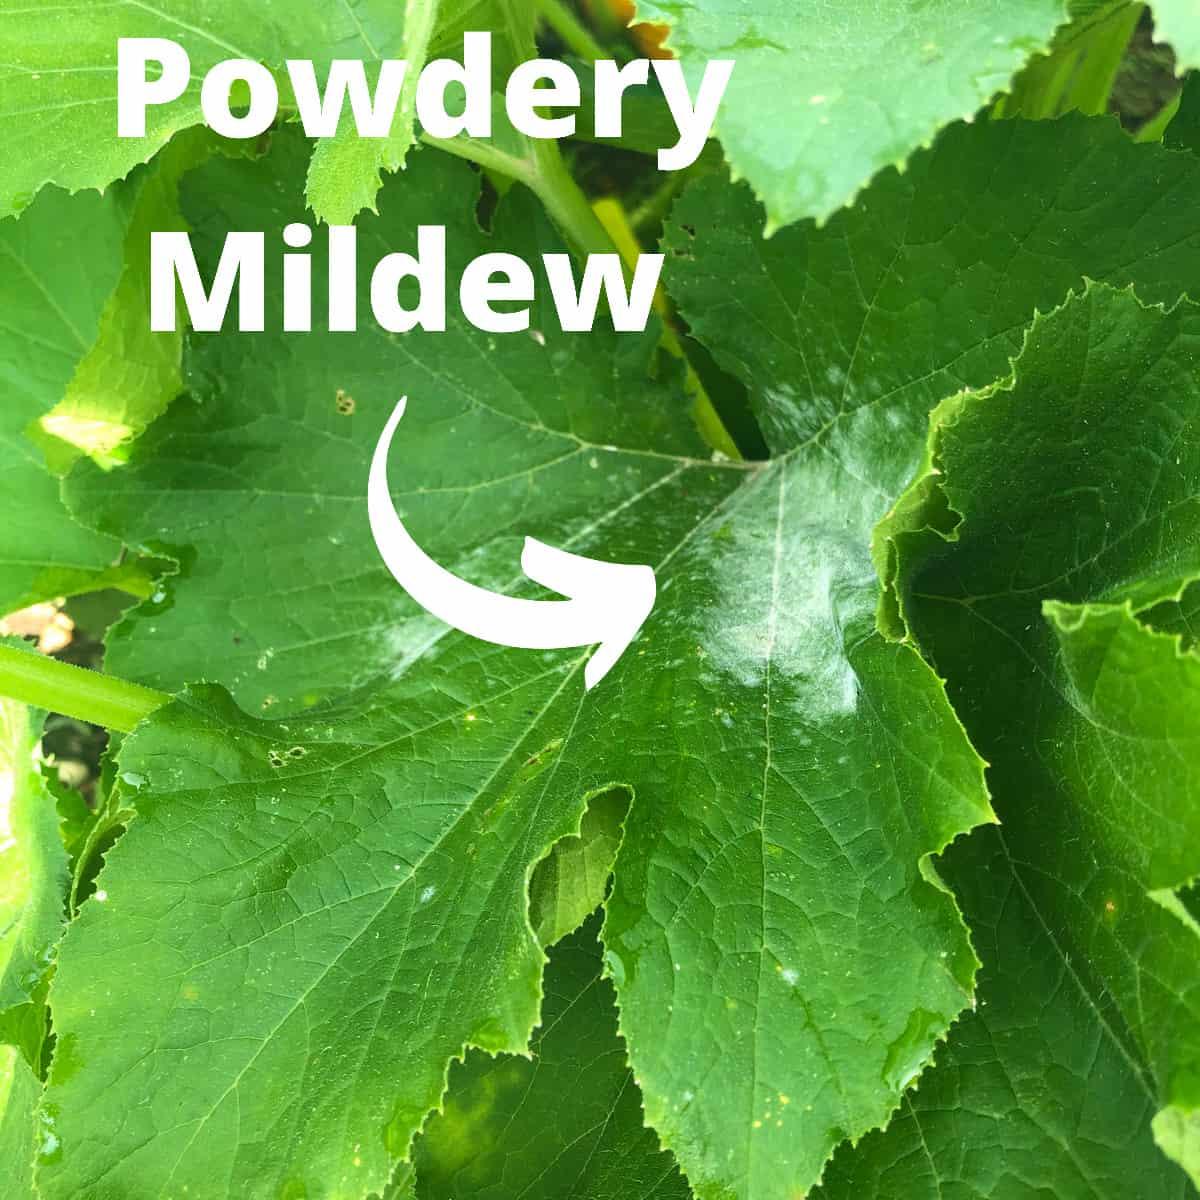 a patch of white powdery mildew on a zucchini leaf